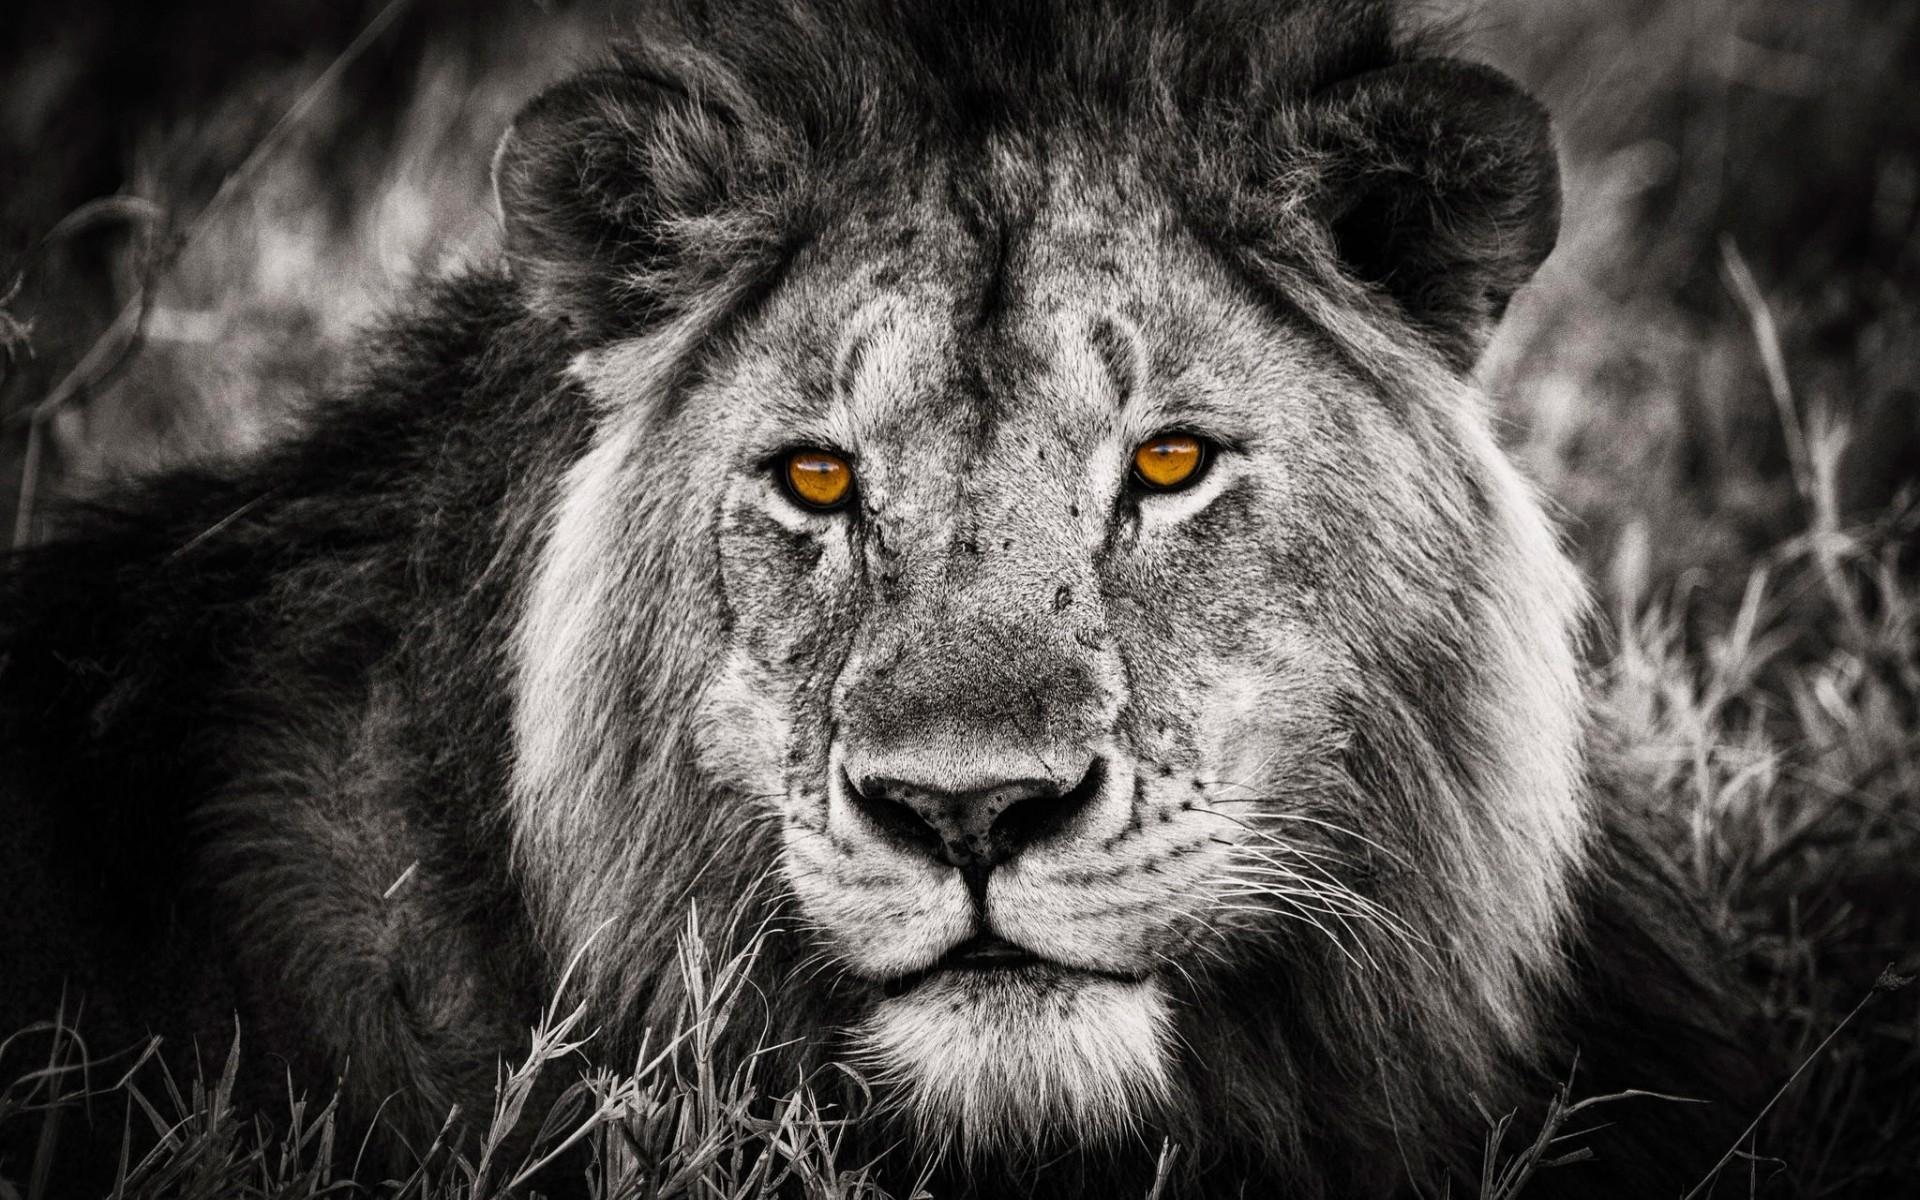 Black And White Lion Portrait Hd Wallpaper Wallpaperfx